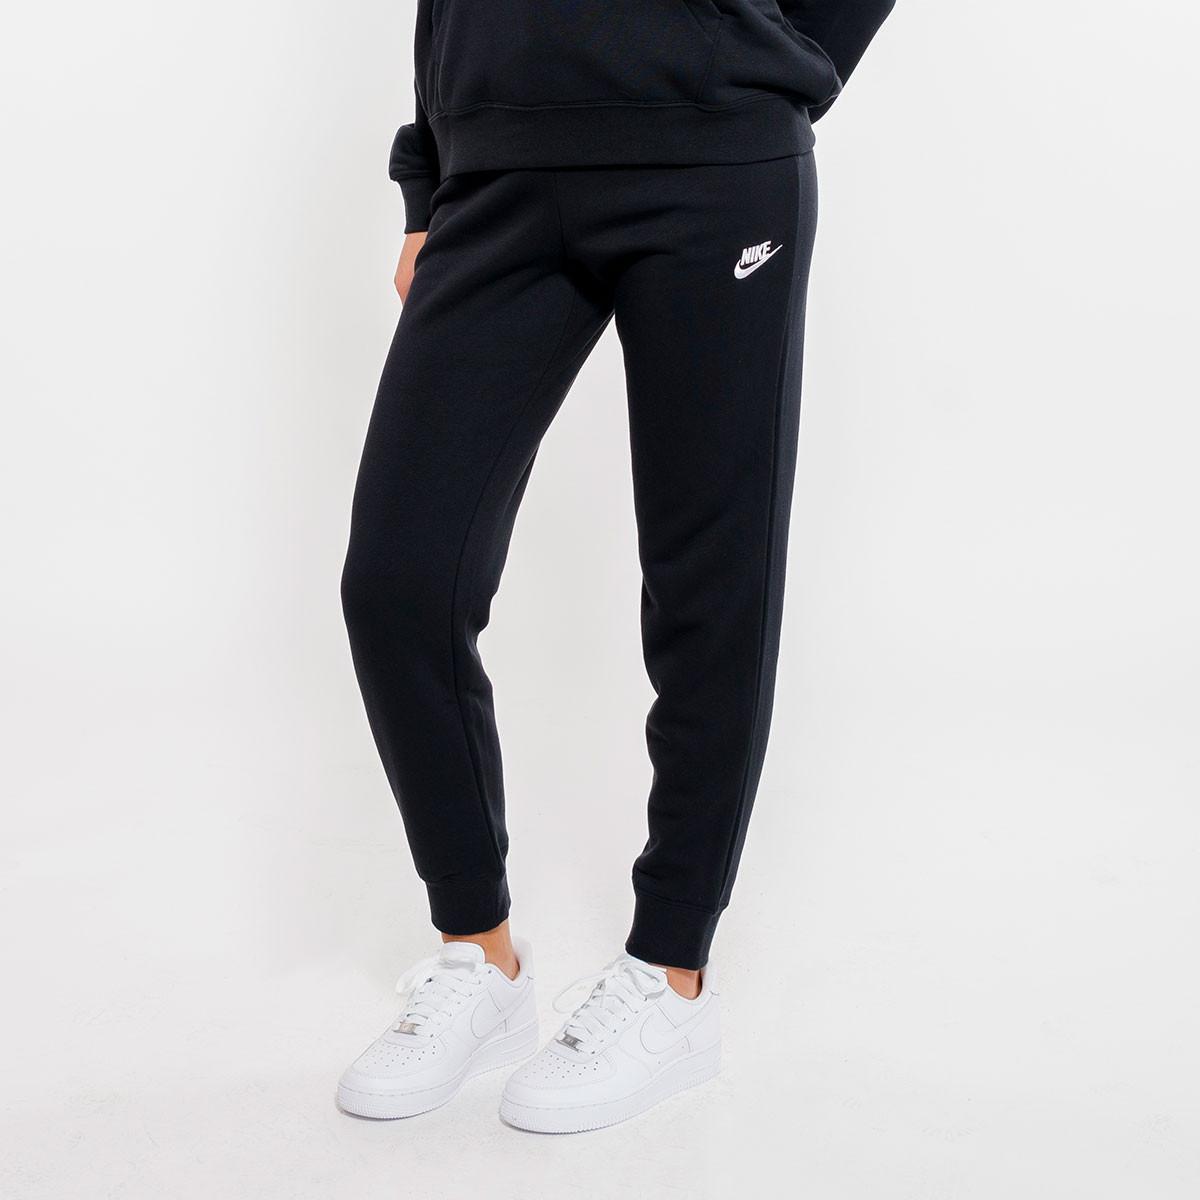 nike donna pantaloni corti sportivi